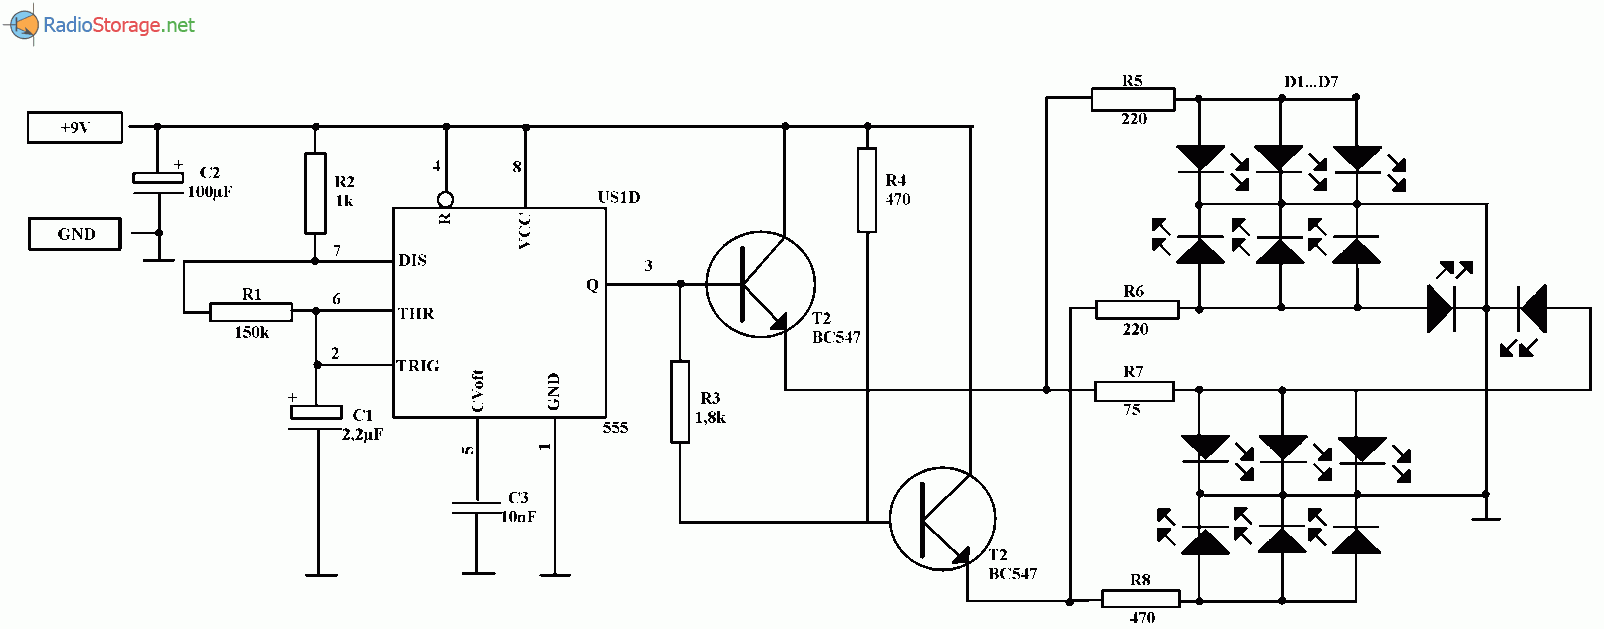 Двухцветная мигалка на светодиодах (NE555): http://www.qrz.ru/schemes/contribute/beginners/dvuhcvetnaa_migalka_na_svetodiodah_ne555.html